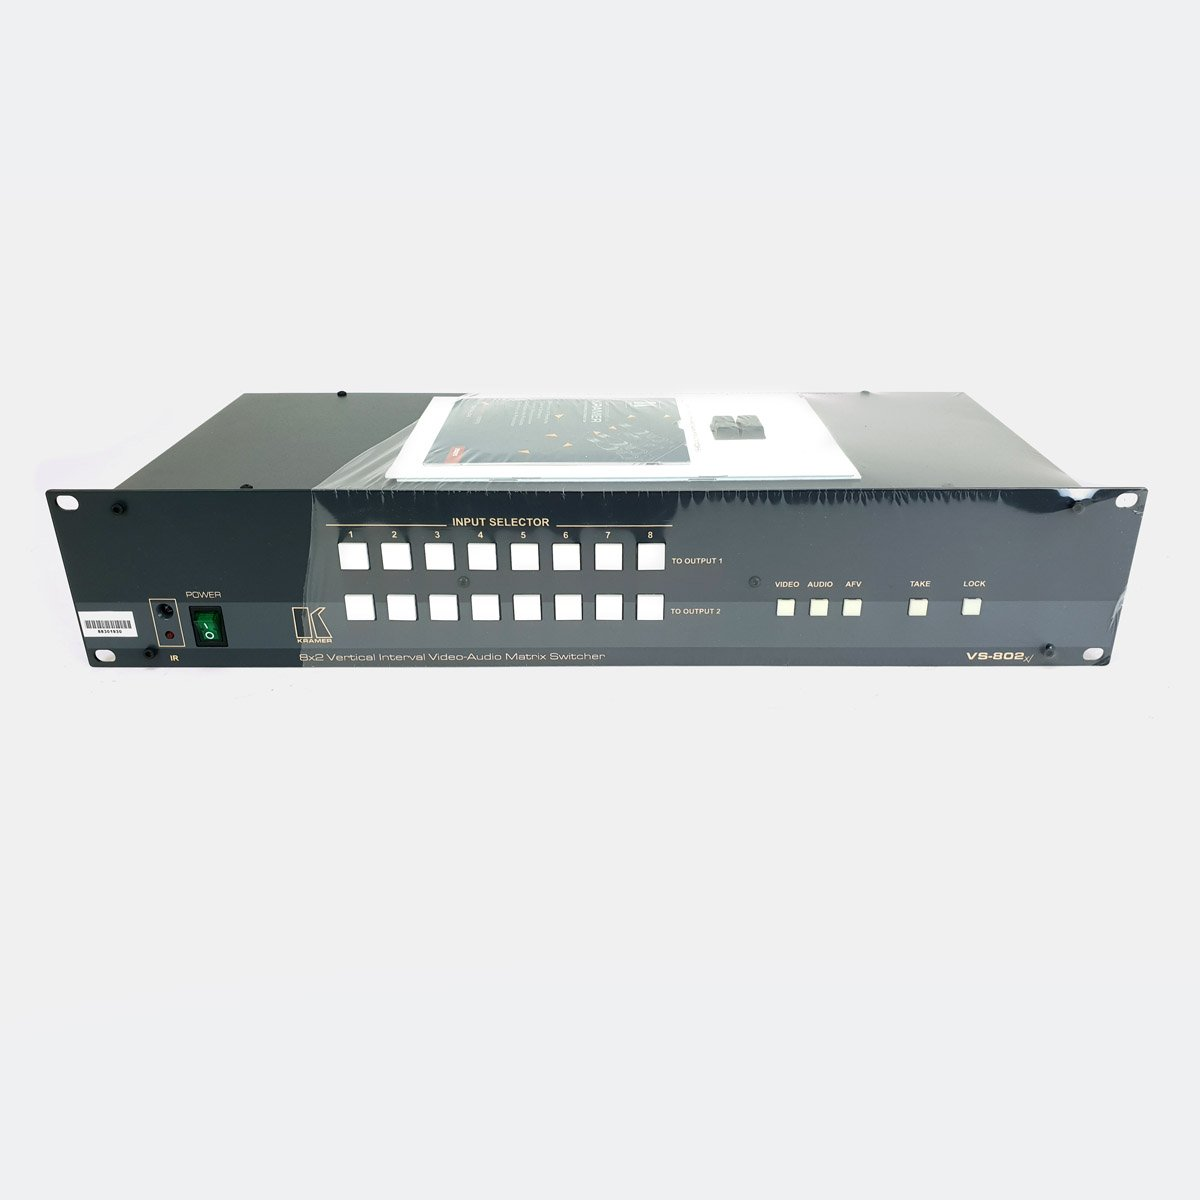 Used Kramer VS-802xl 8x2:2 Composite Video Matrix Switcher